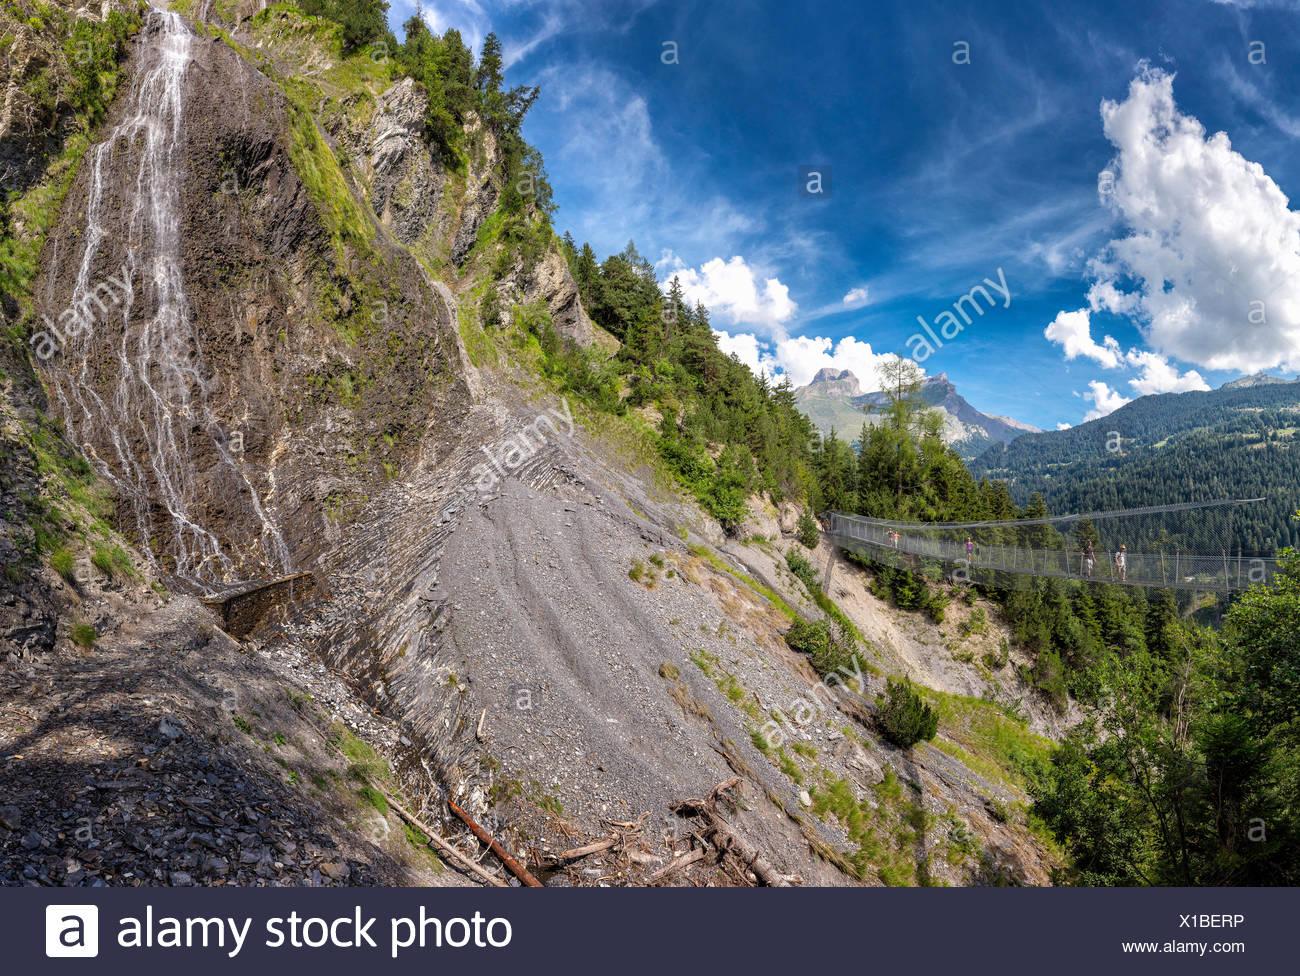 Bisse du Torrent Neuf Bisse wandering suspension bridge bridge landscape water summer mountains hills people waterfall Saviese - Stock Image